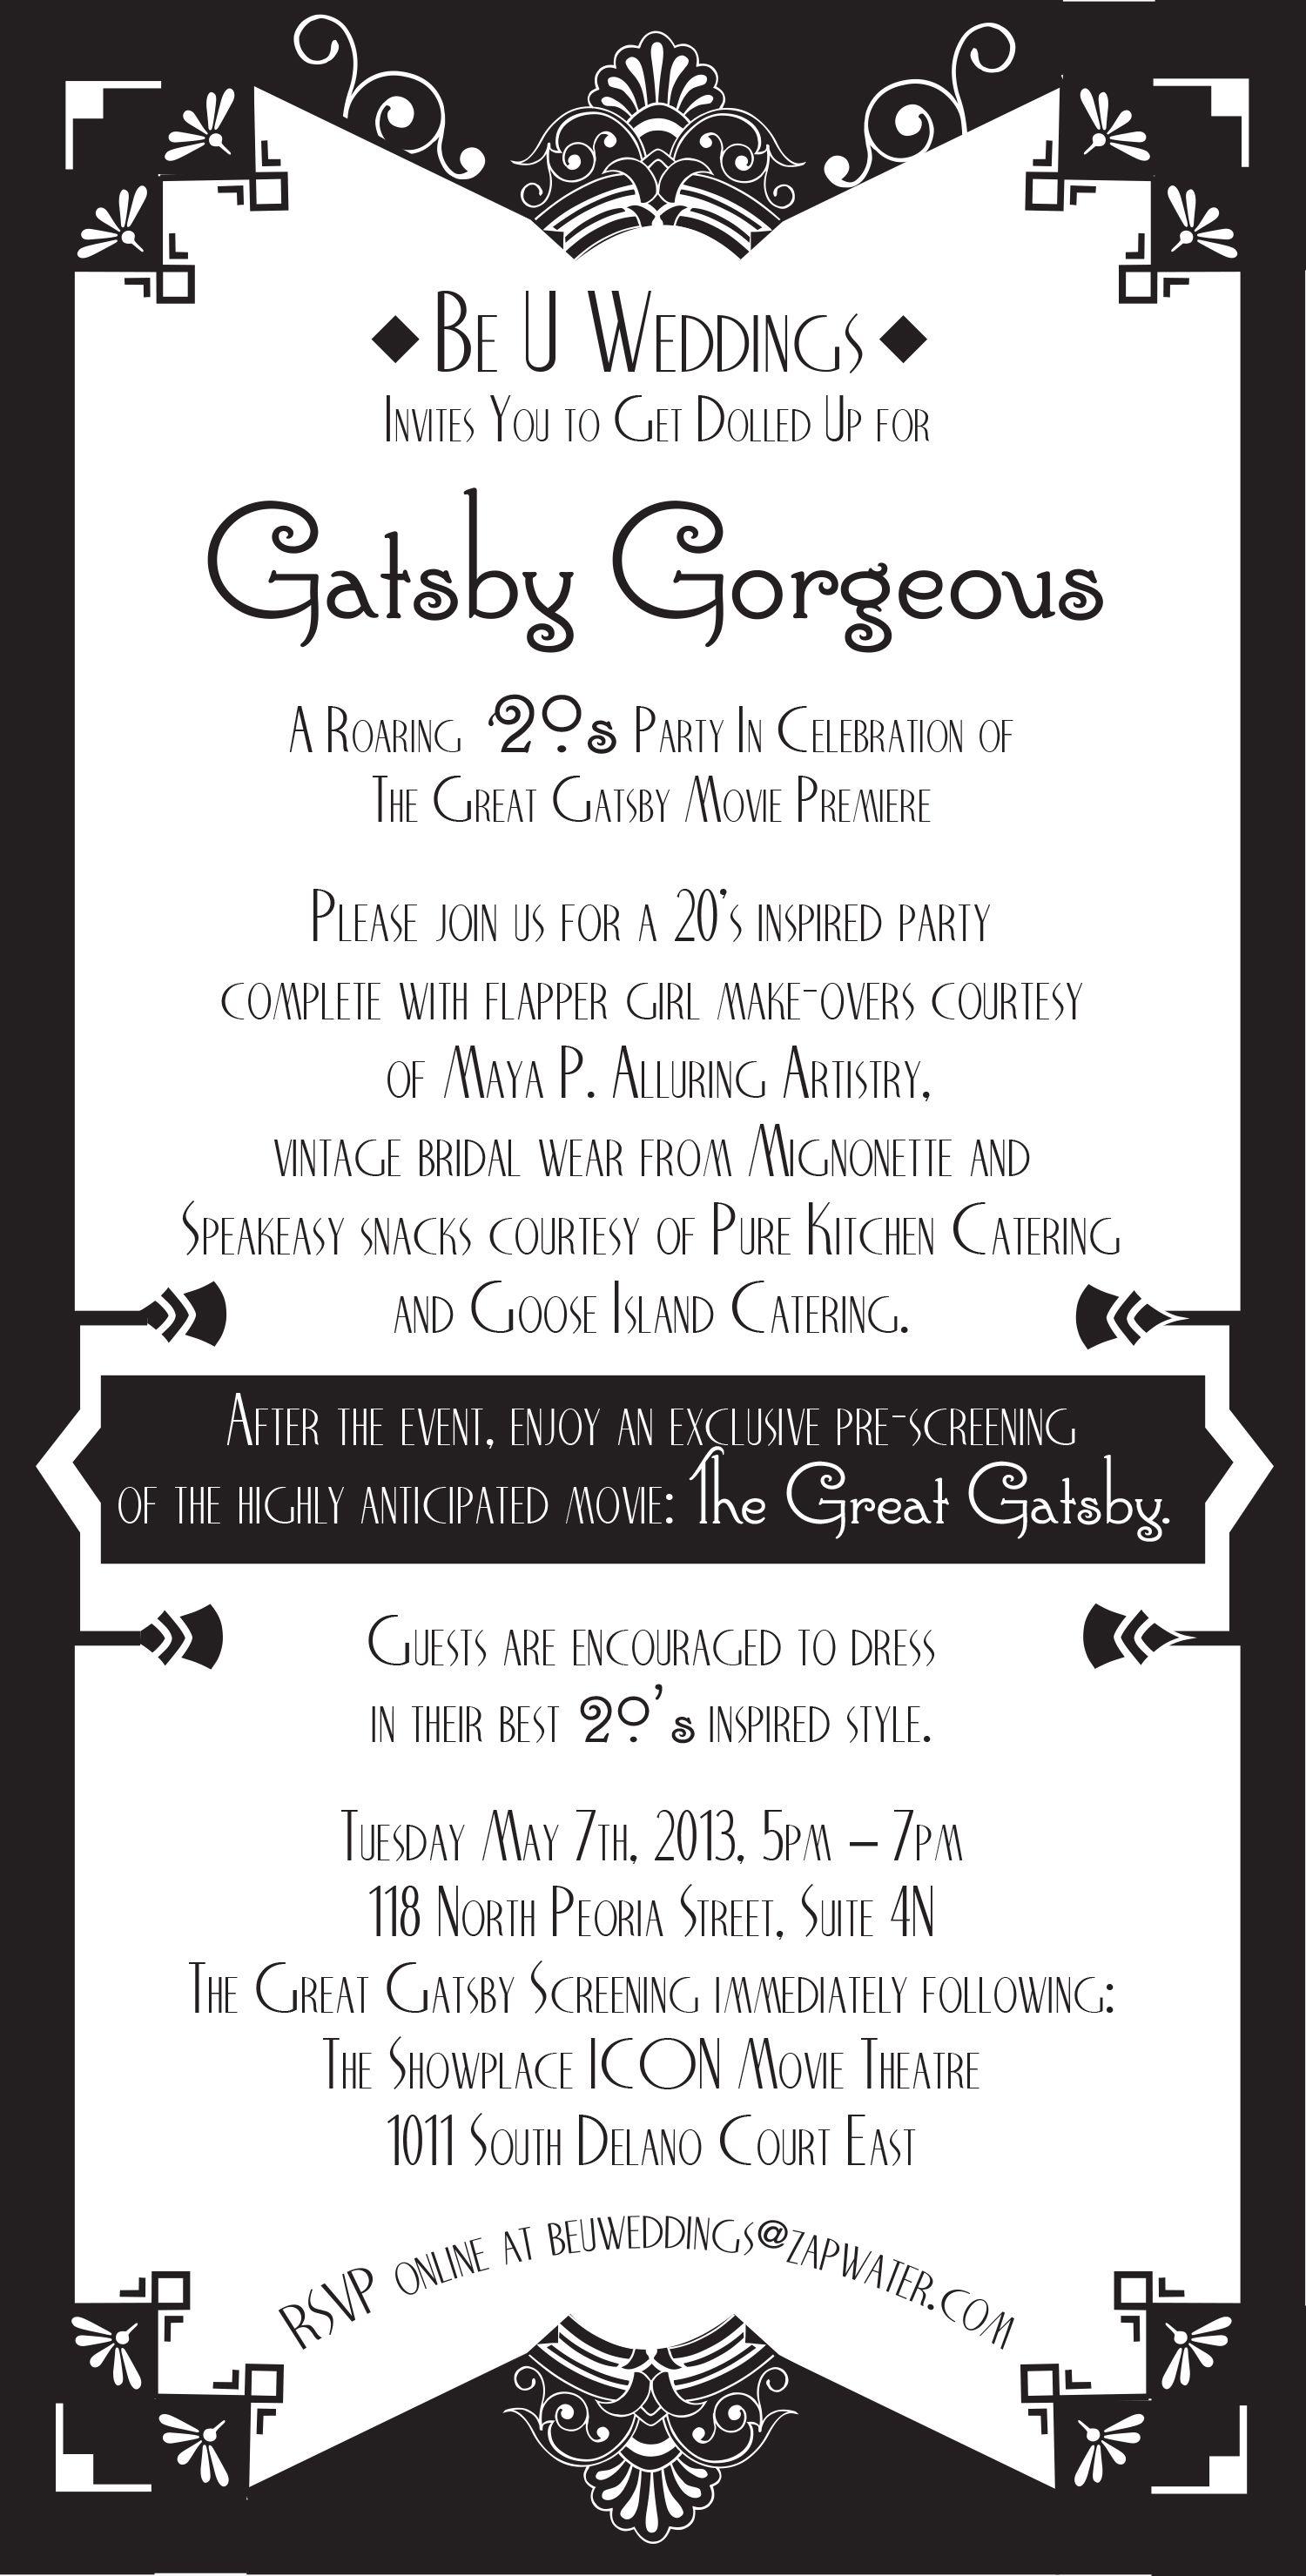 Theme Party Invitations Wording | Invitationswedd.org